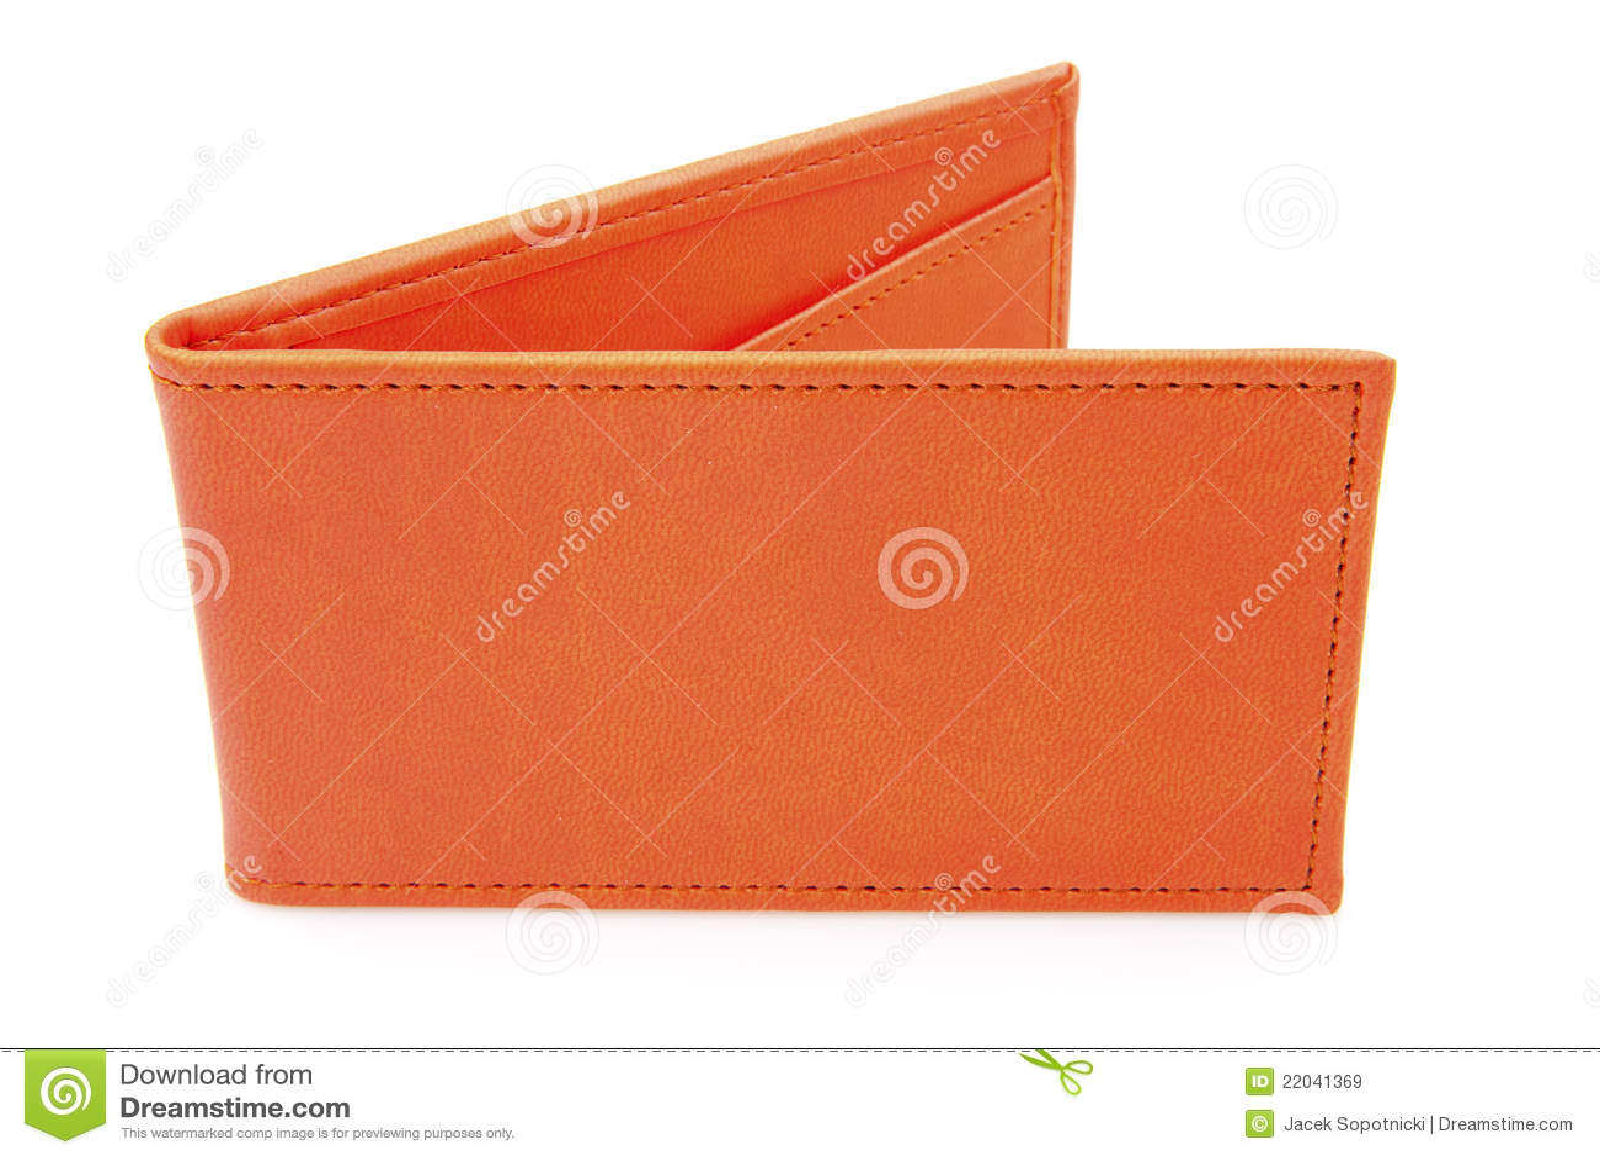 Orange business card holder royalty free stock images for Orange business card holder